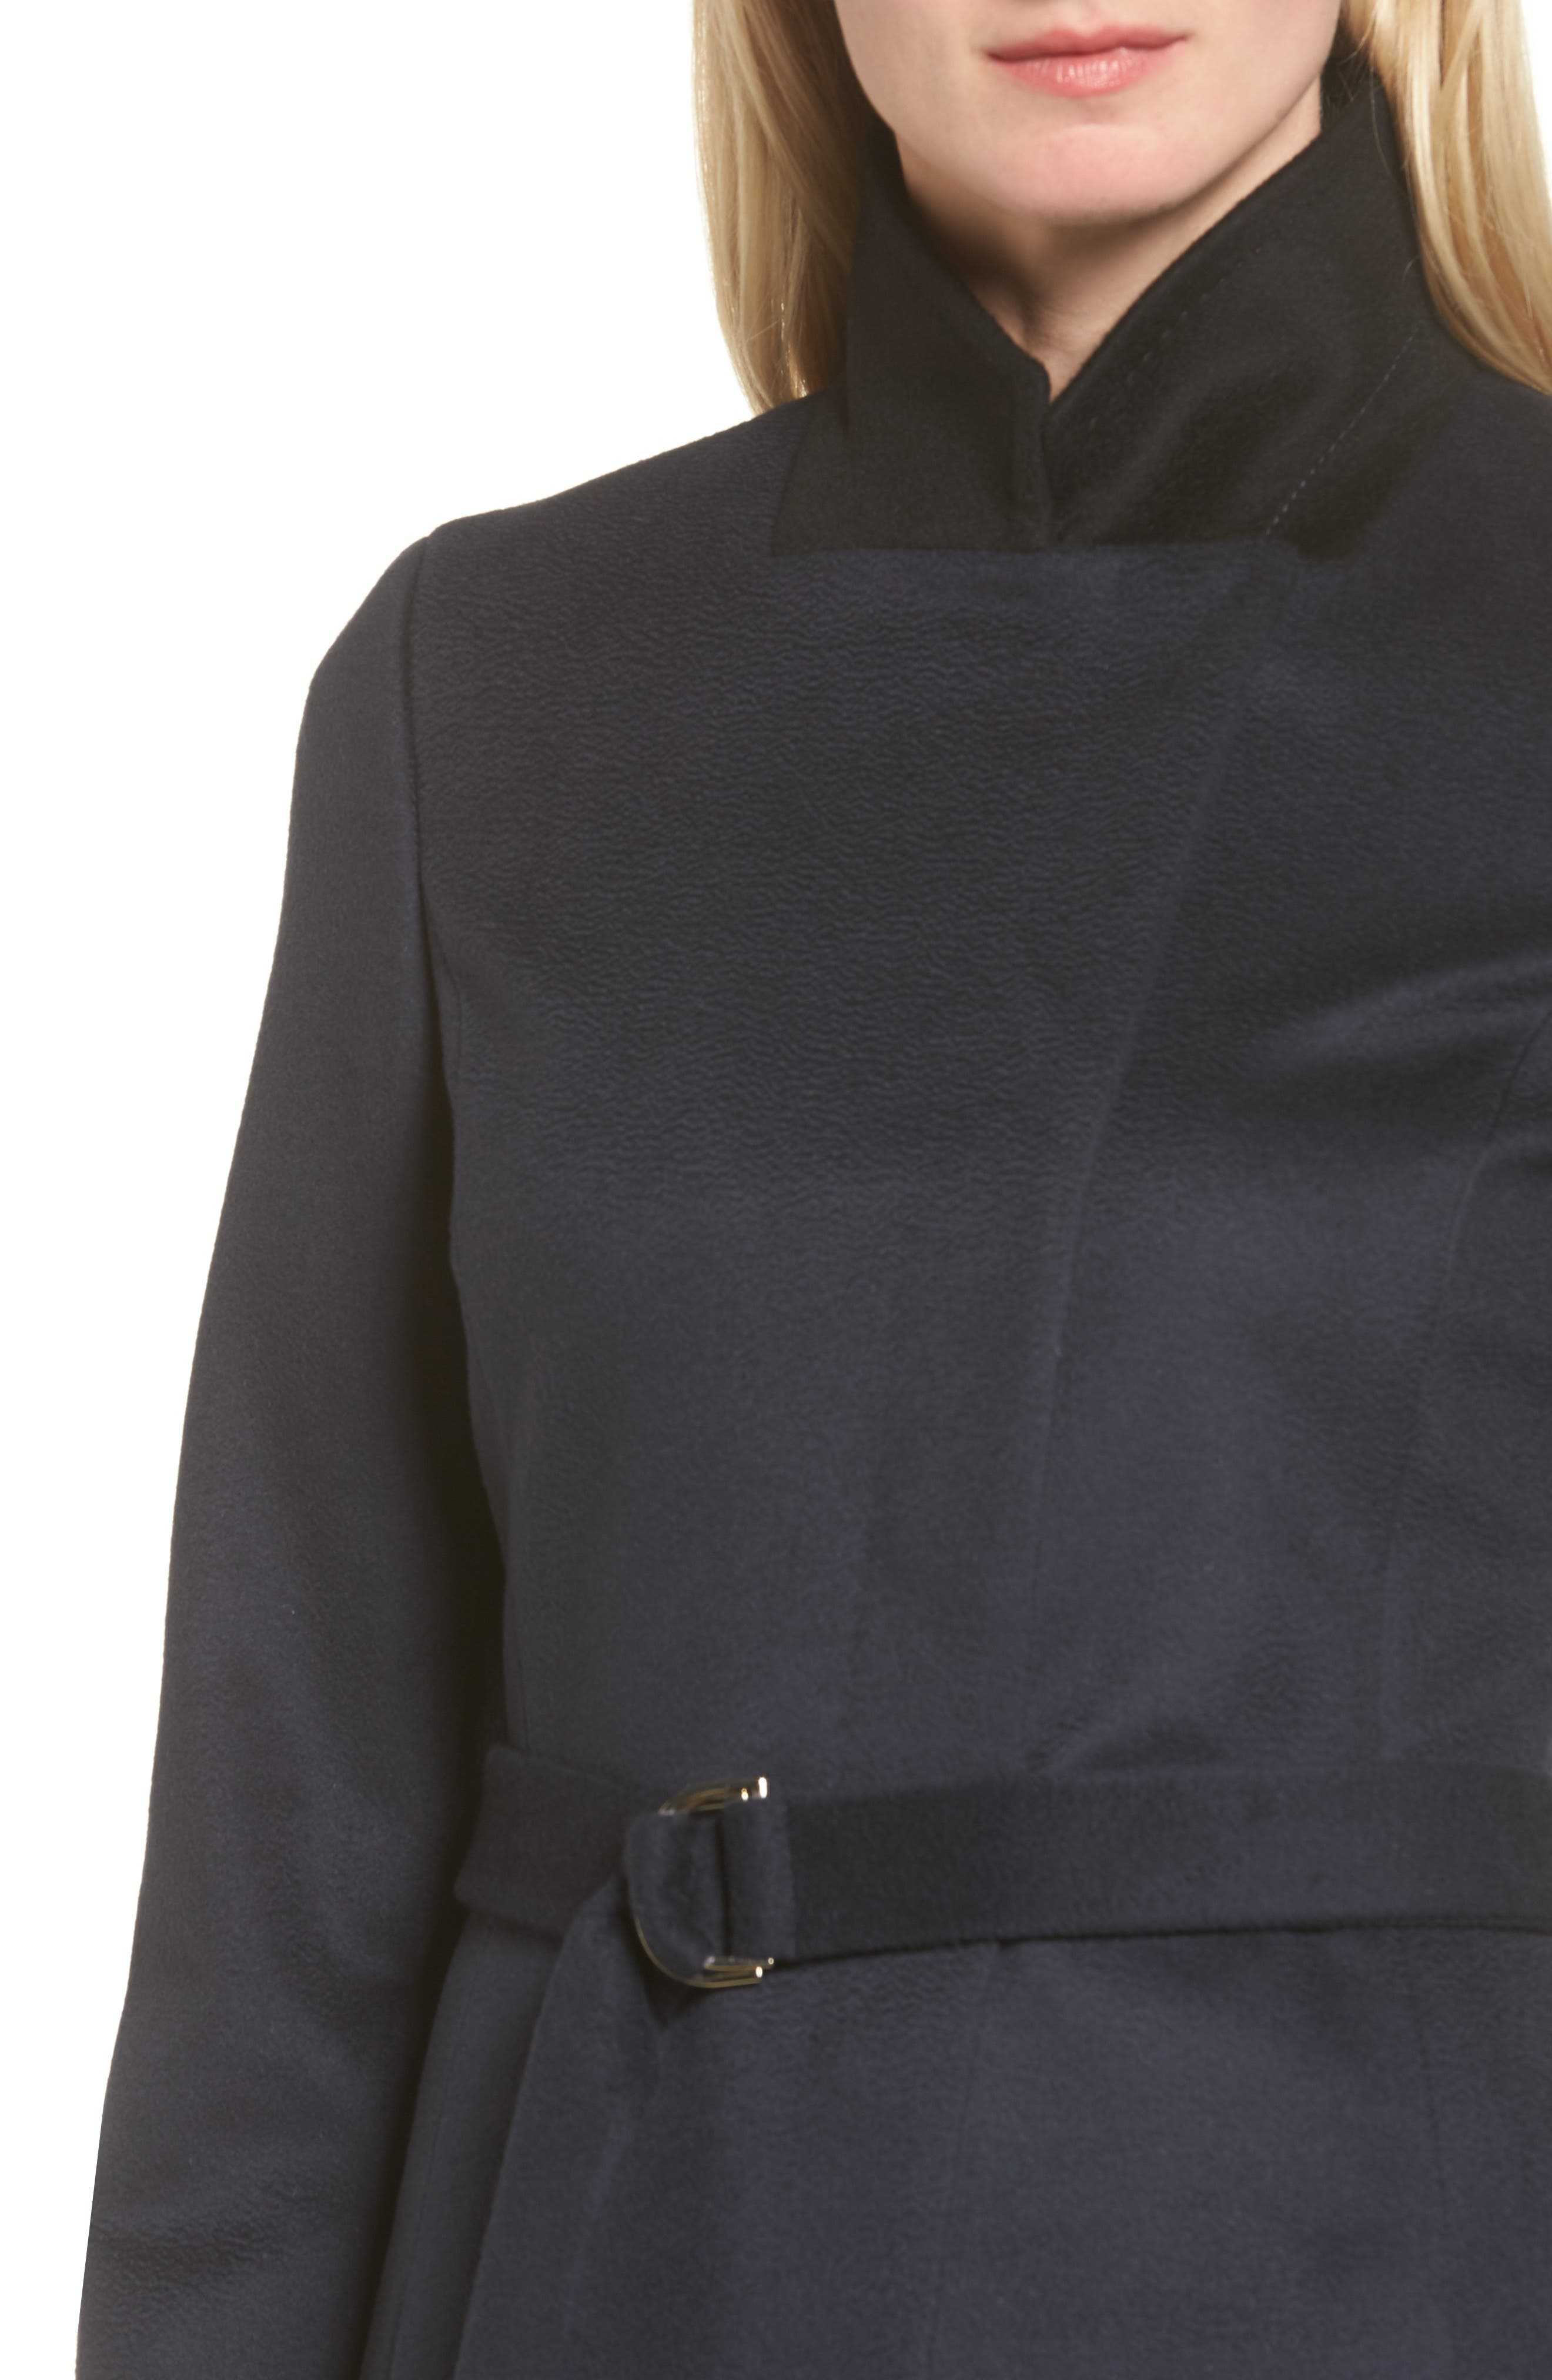 Cargona Wool Coat,                             Alternate thumbnail 4, color,                             480